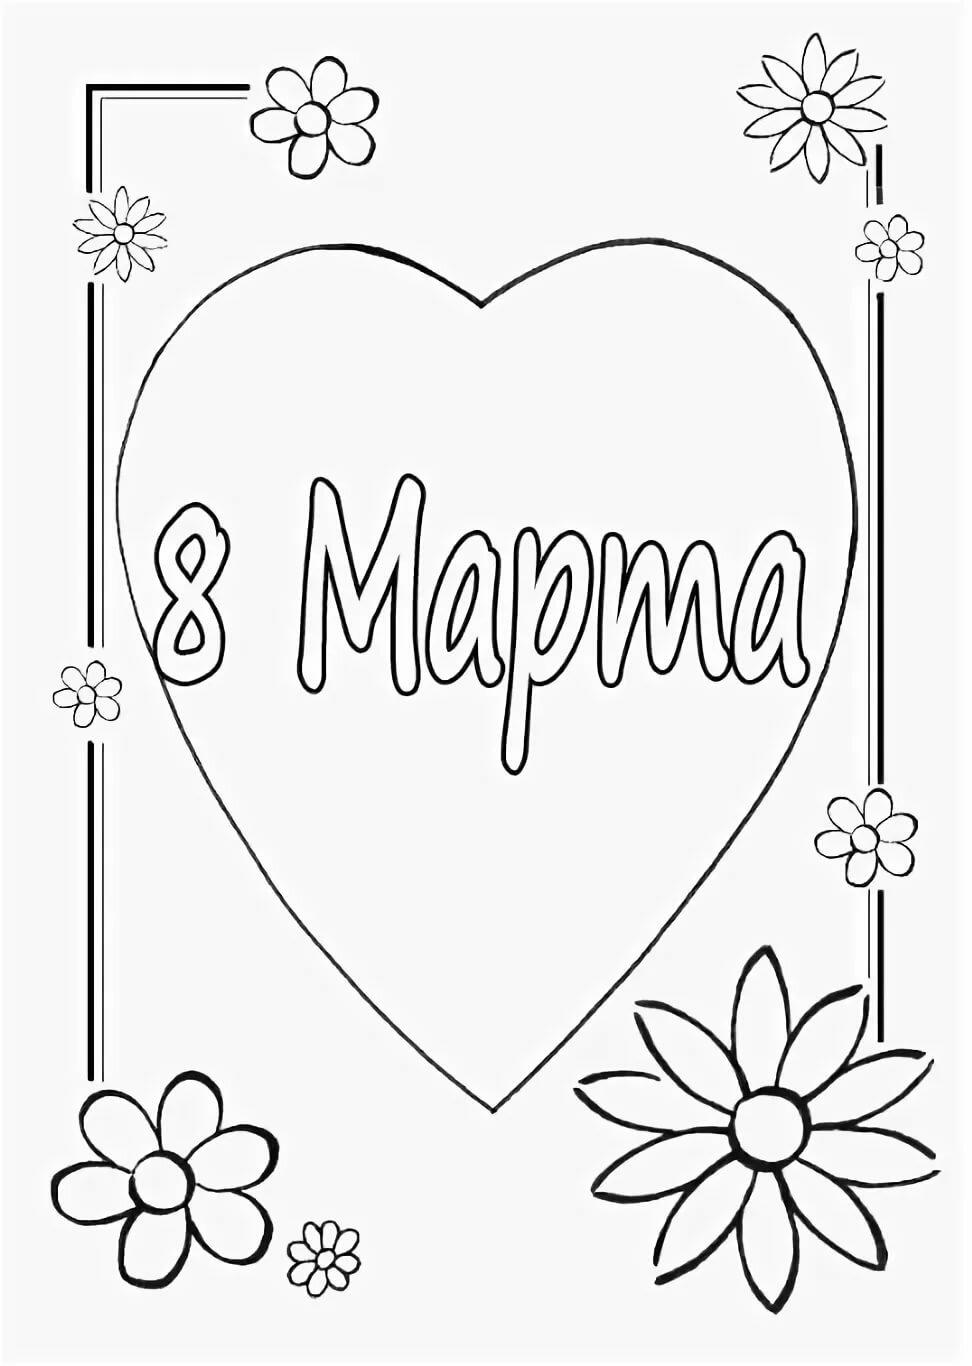 Открытки для мамы на 8 марта с шаблонами